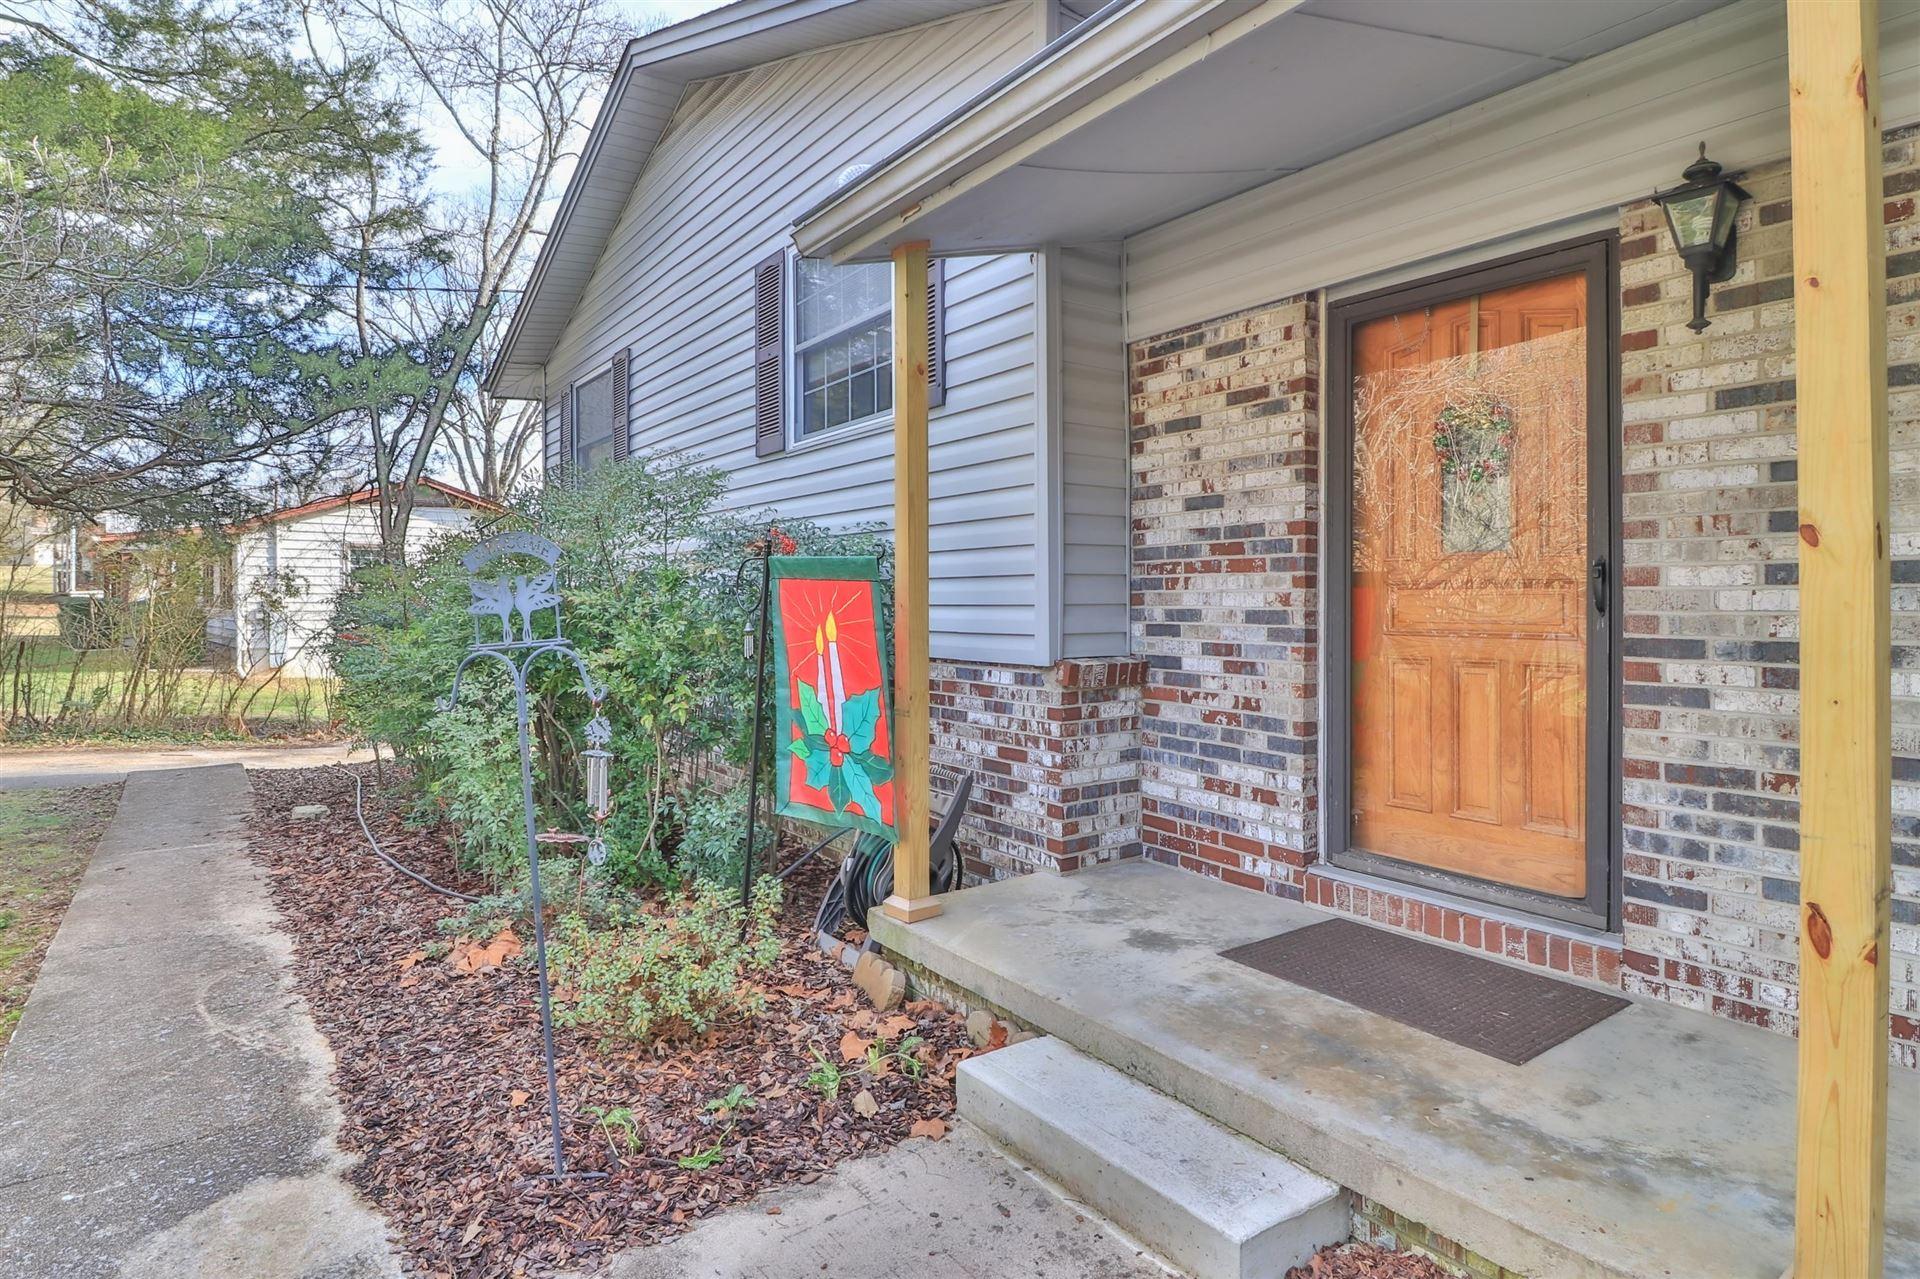 Photo of 723 Robertsville Rd, Oak Ridge, TN 37830 (MLS # 1139143)